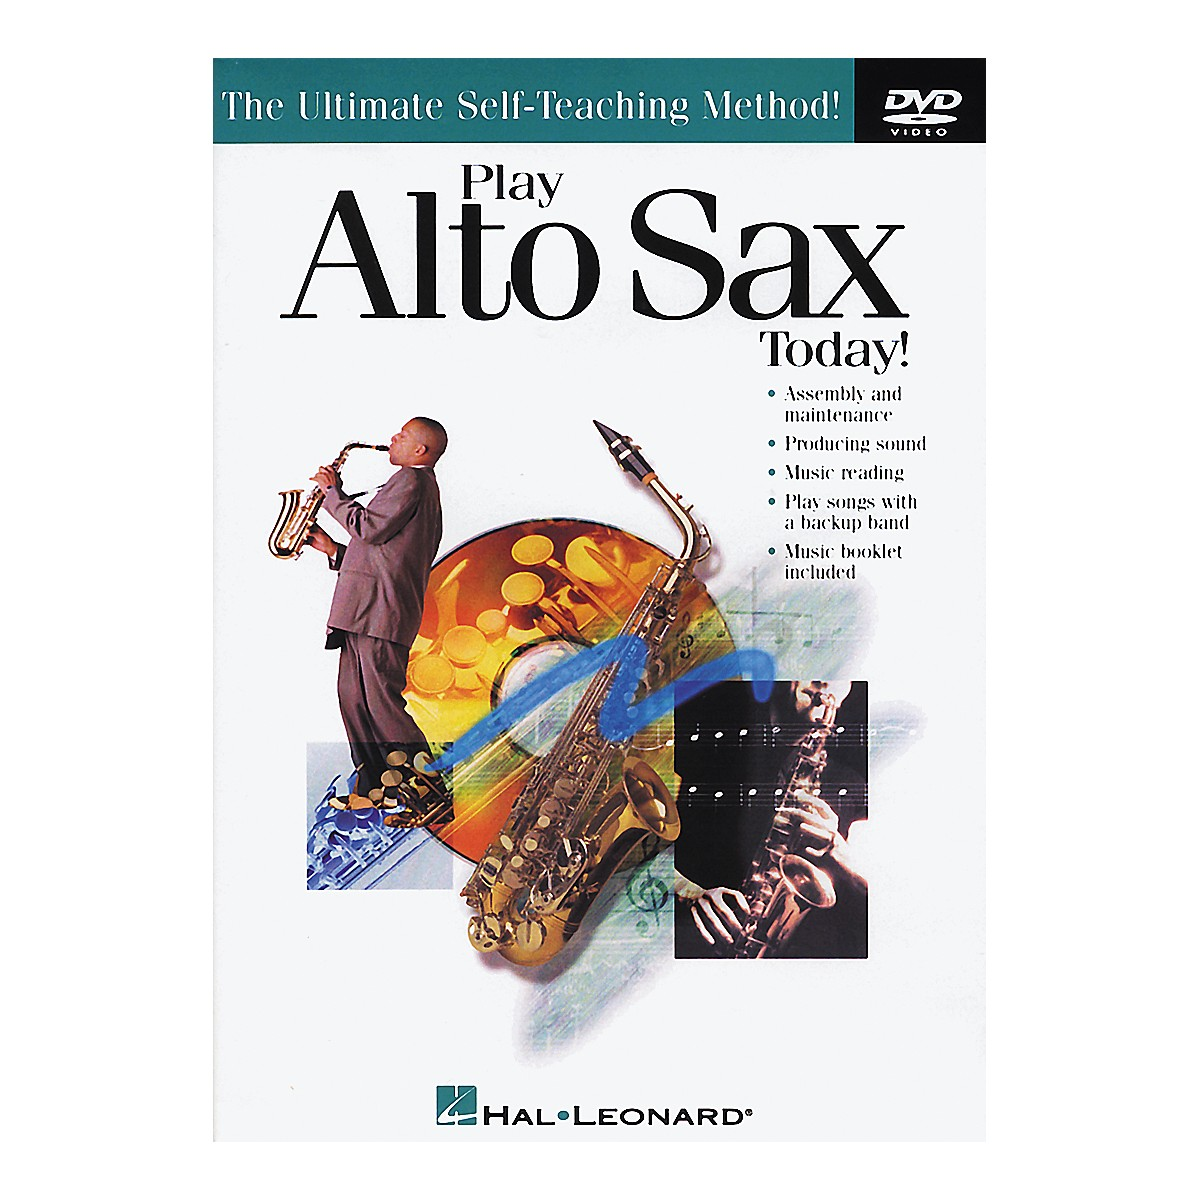 Hal Leonard Play Alto Sax Today! DVD